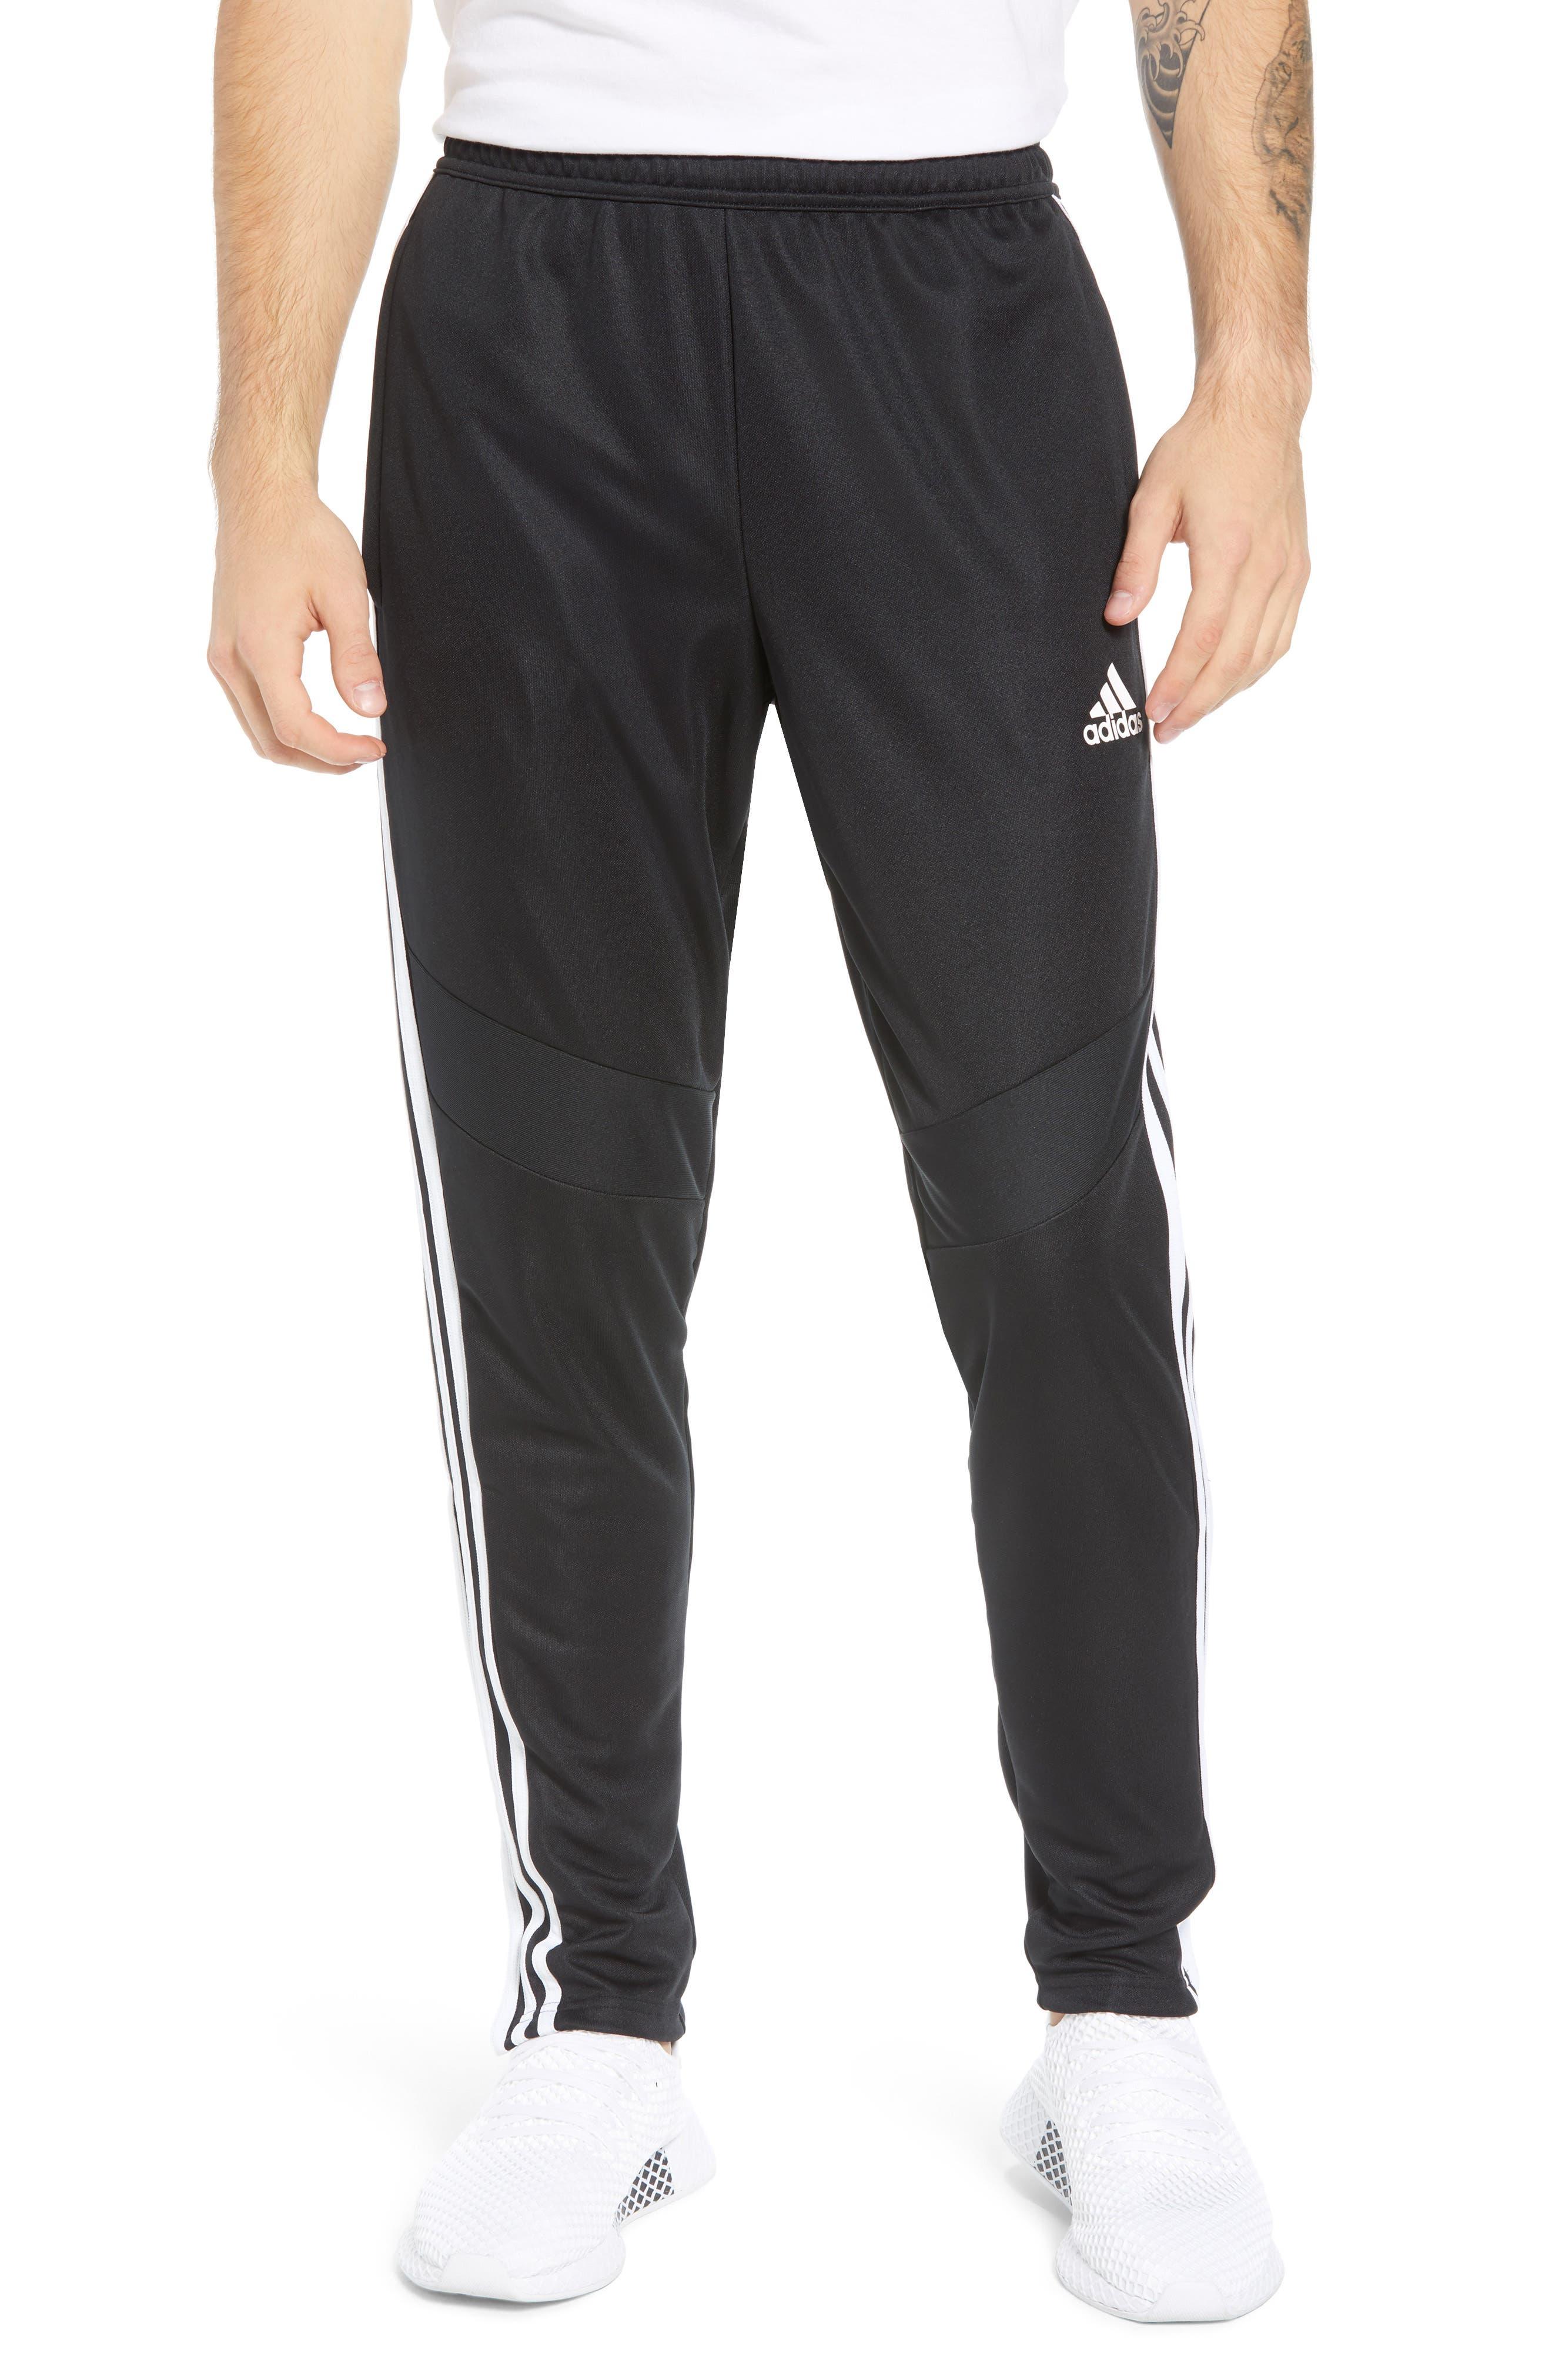 ADIDAS,                             Tiro Soccer Training Pants,                             Main thumbnail 1, color,                             BLACK/ WHITE